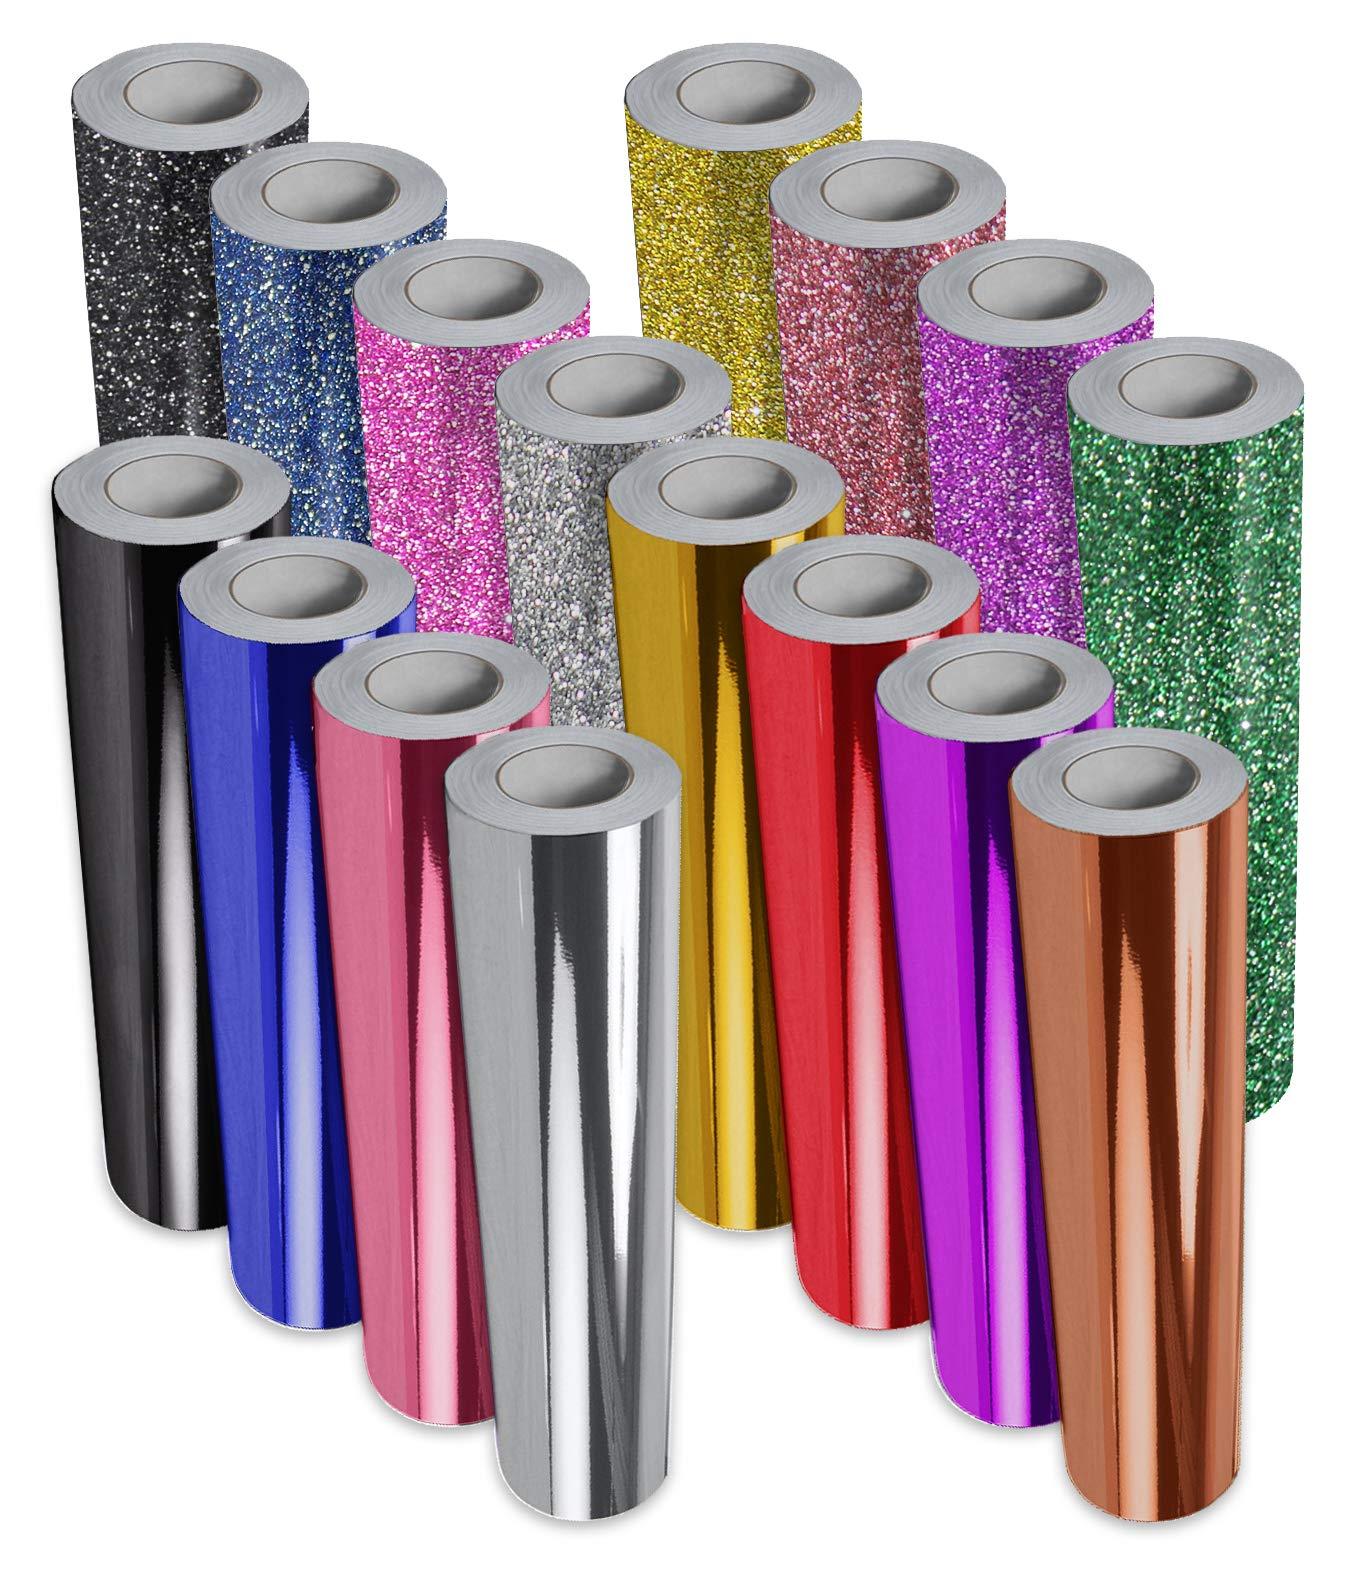 VViViD 16-Color Chrome Gloss & Matte Glitter DECO65 Permanent Adhesive Craft Vinyl 1ft x 5ft Roll Bundle